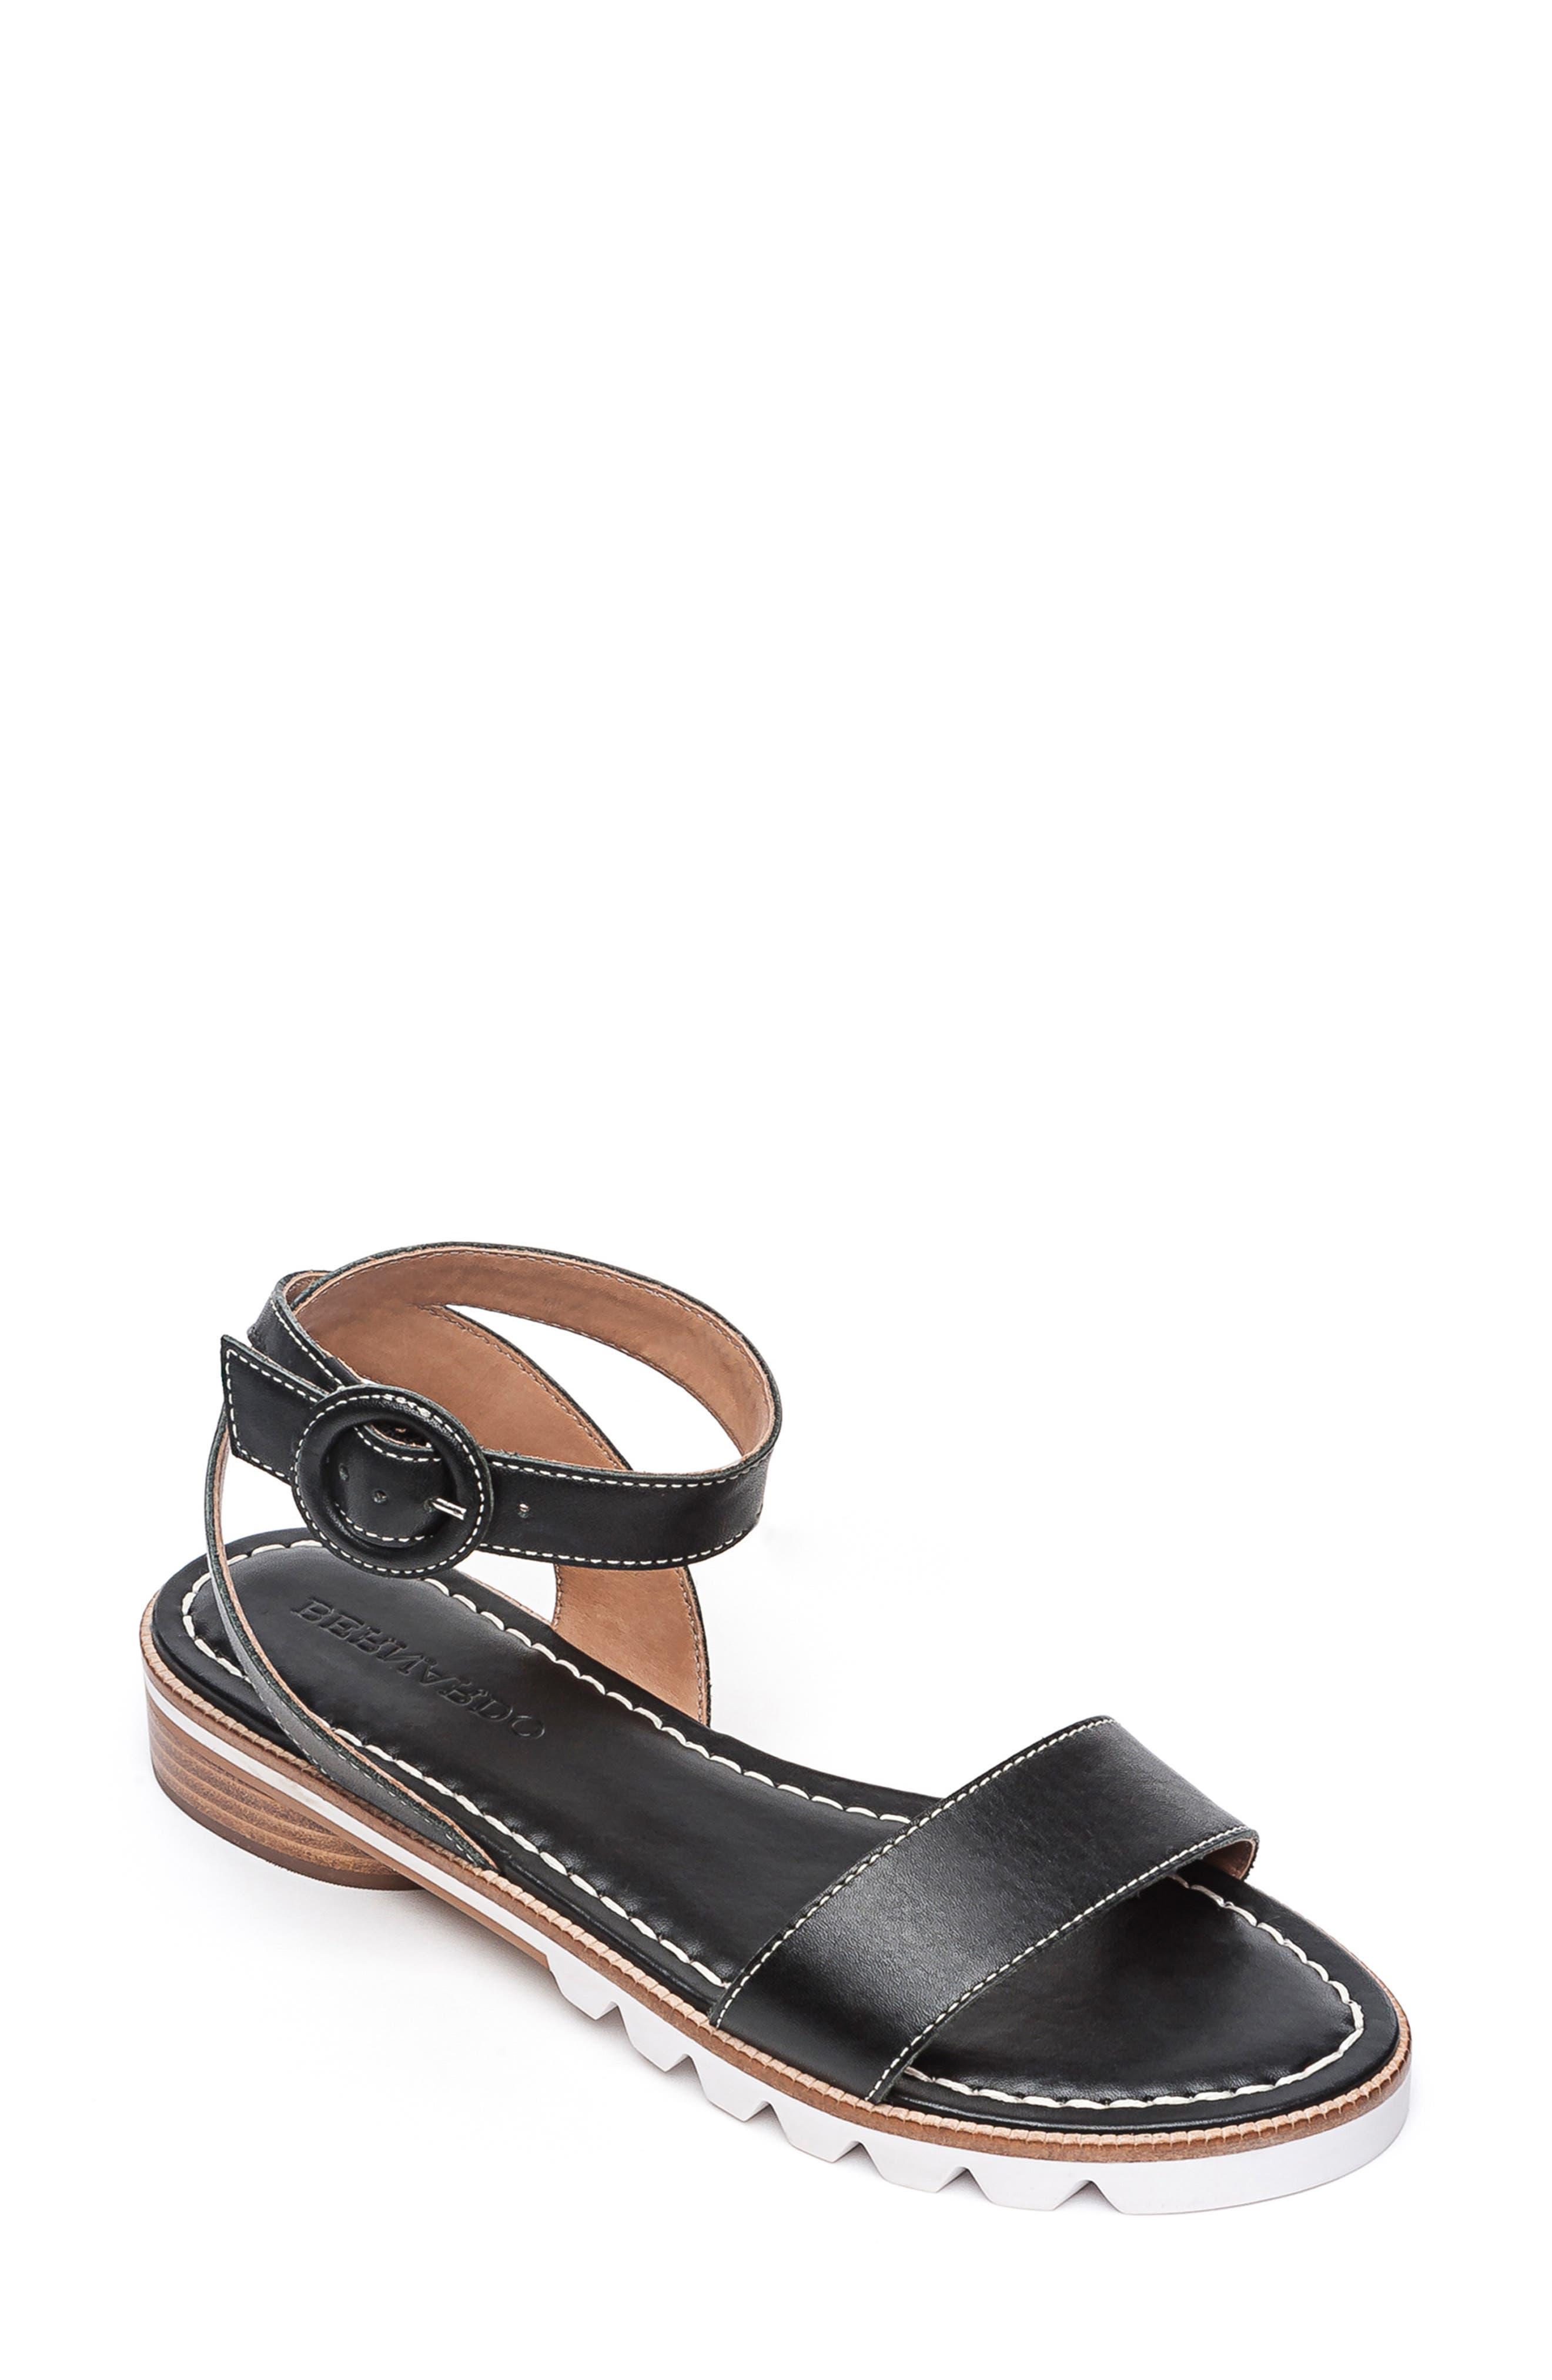 BERNARDO, Footwear Alexis Ankle Strap Sandal, Main thumbnail 1, color, BLACK